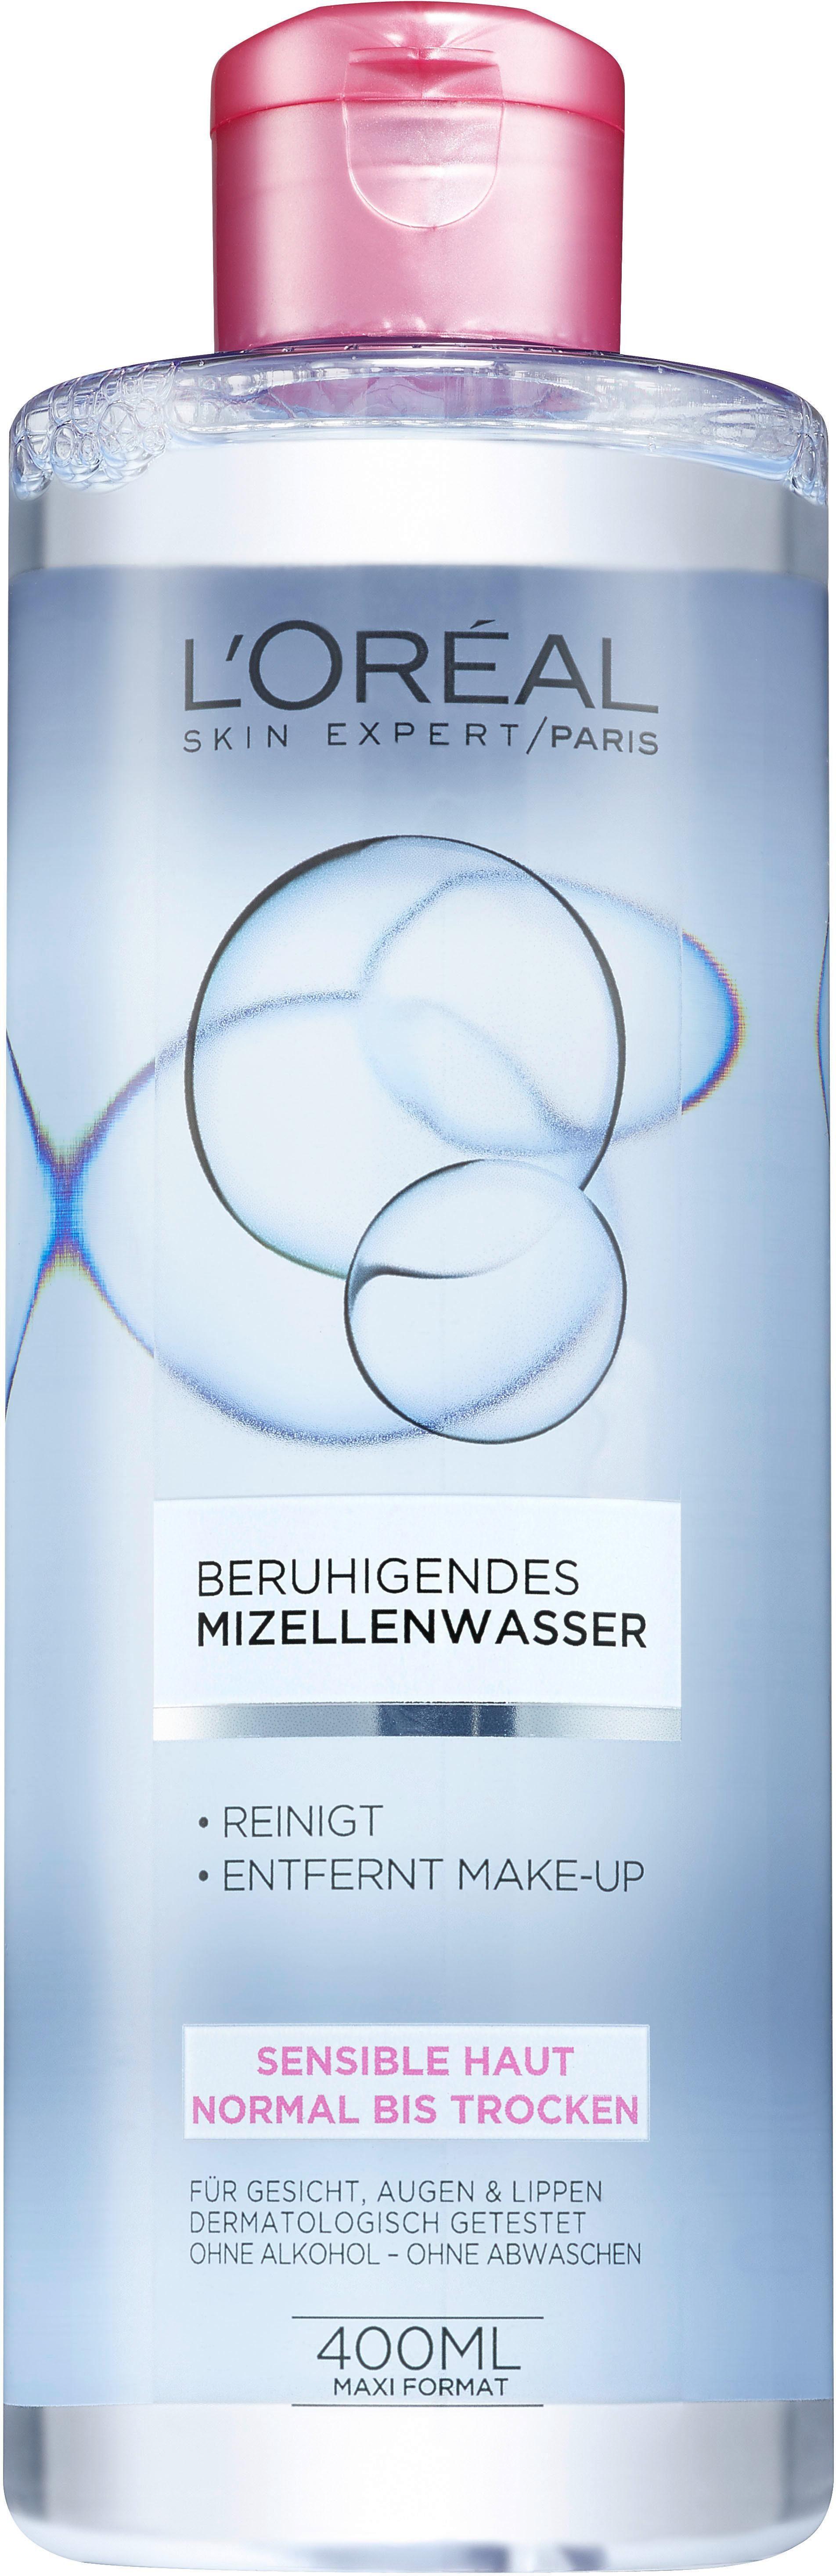 L'Oréal Paris, »Mizellenwasser Sensitiv«, Gesichtsreinigung